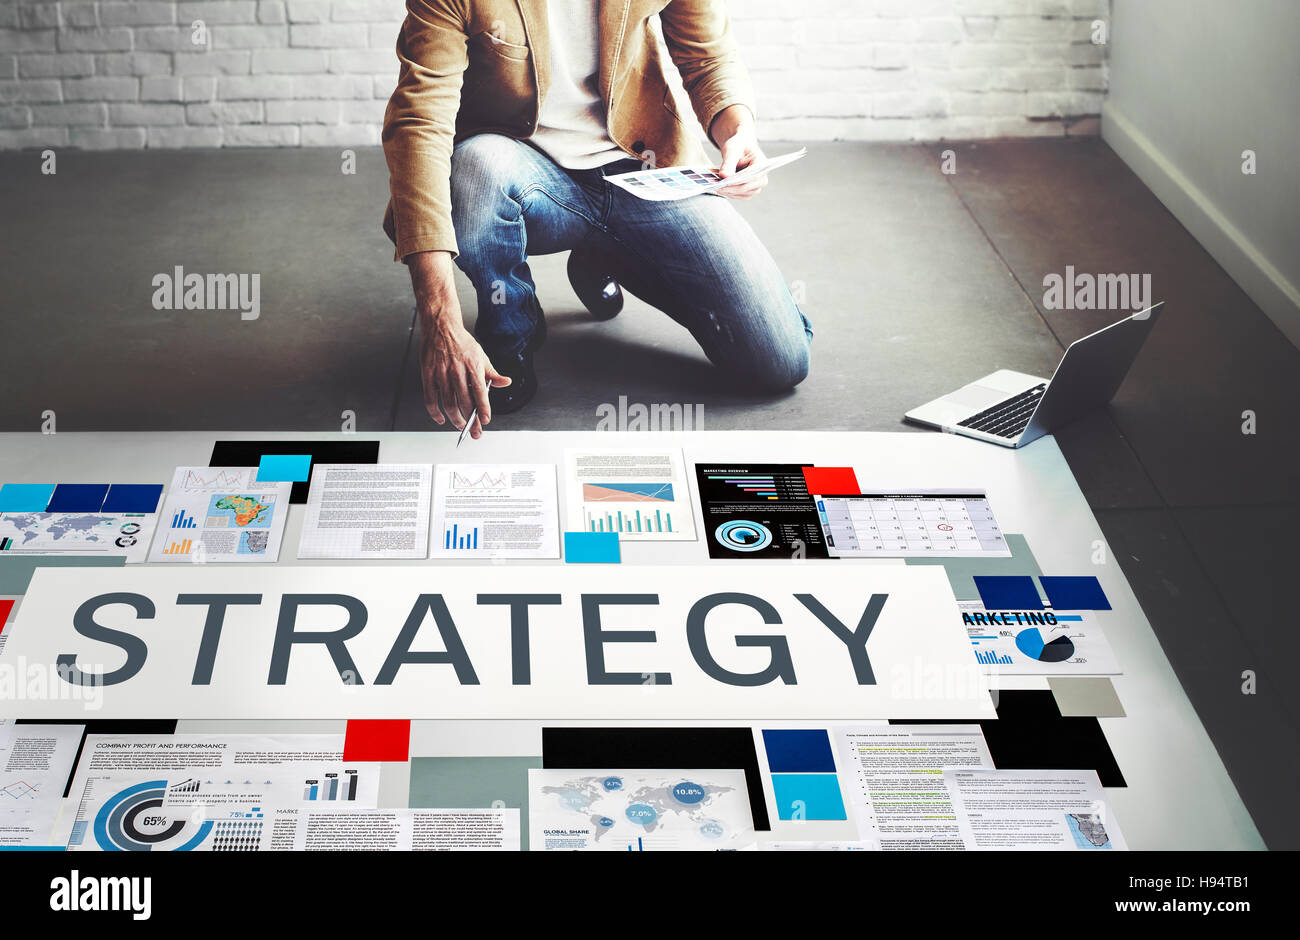 Strategy Strategize Strategic Tactics Planning Concept - Stock Image